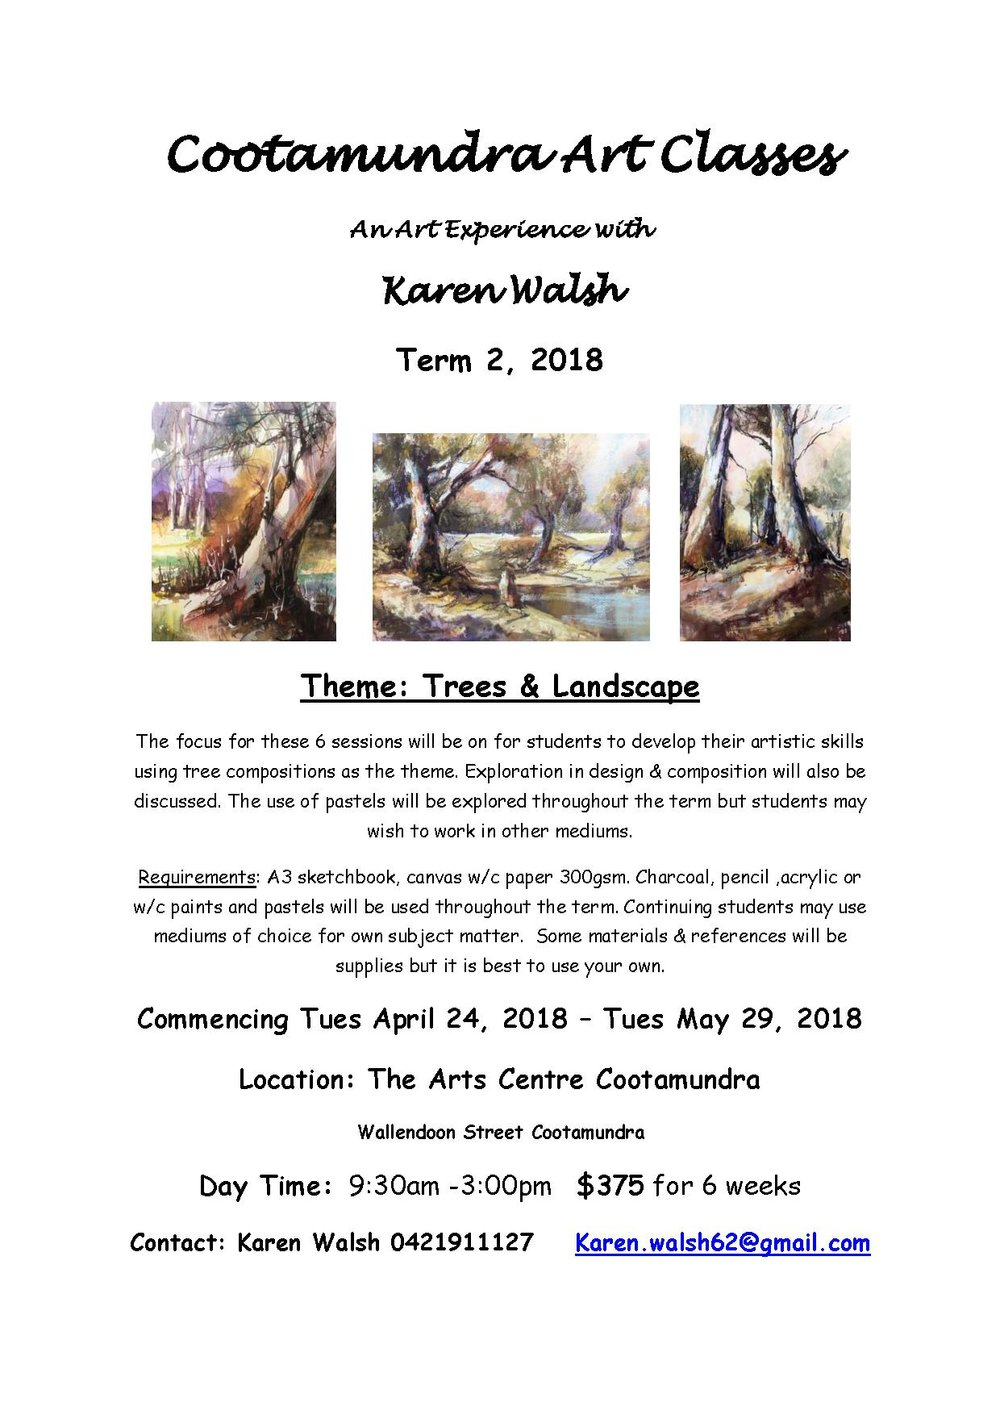 2018 term 2 Art Experience  flyer Cootamundra  Trees.jpg